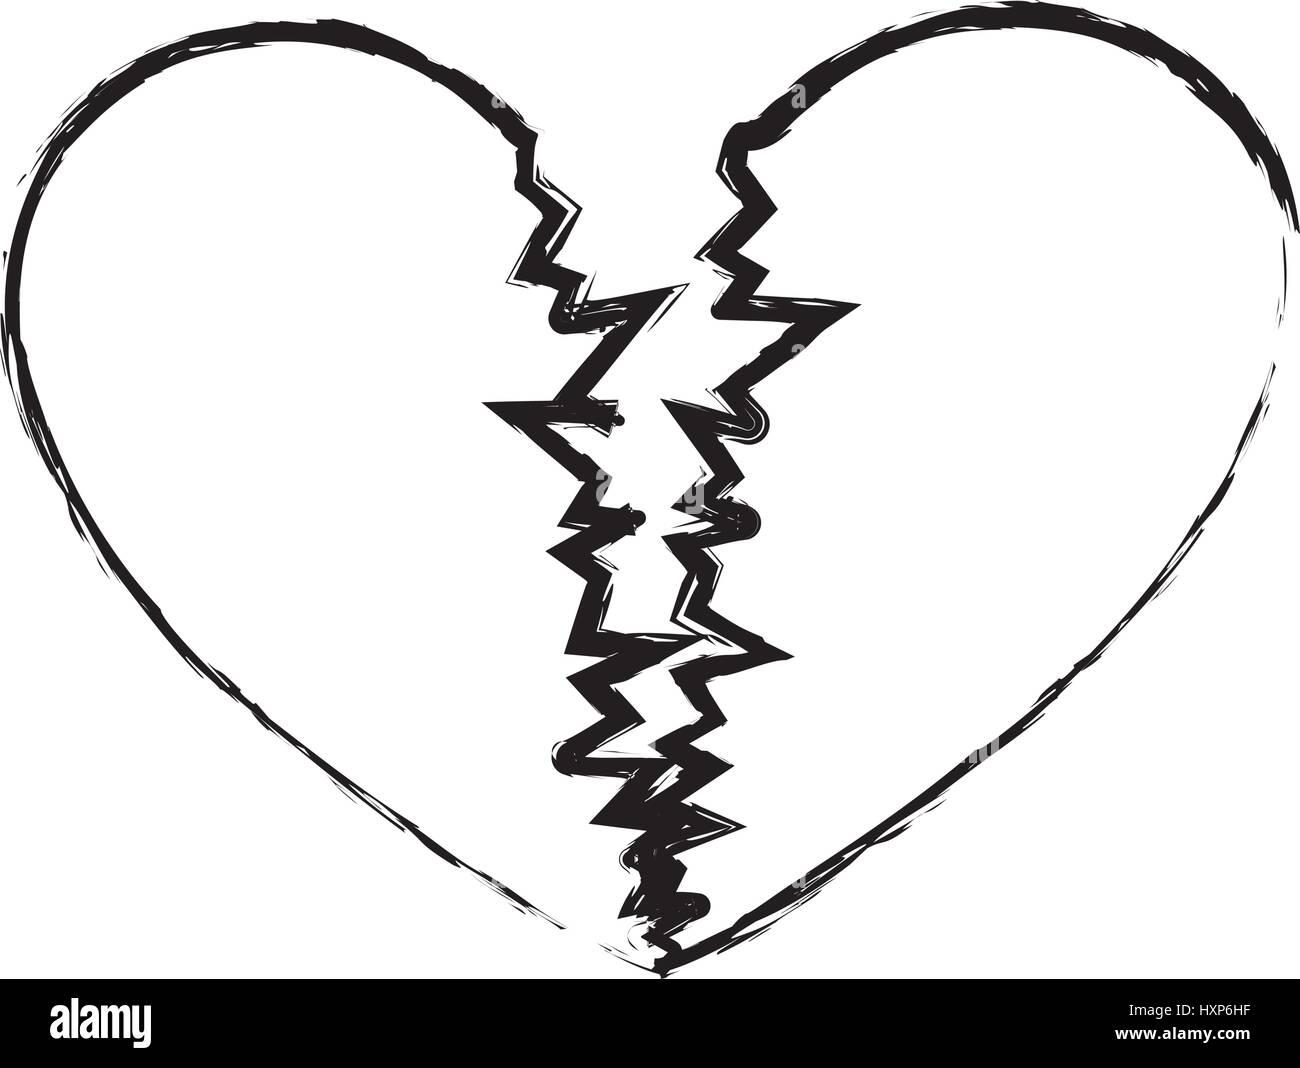 Monochrome Sketch Of Broken Heart